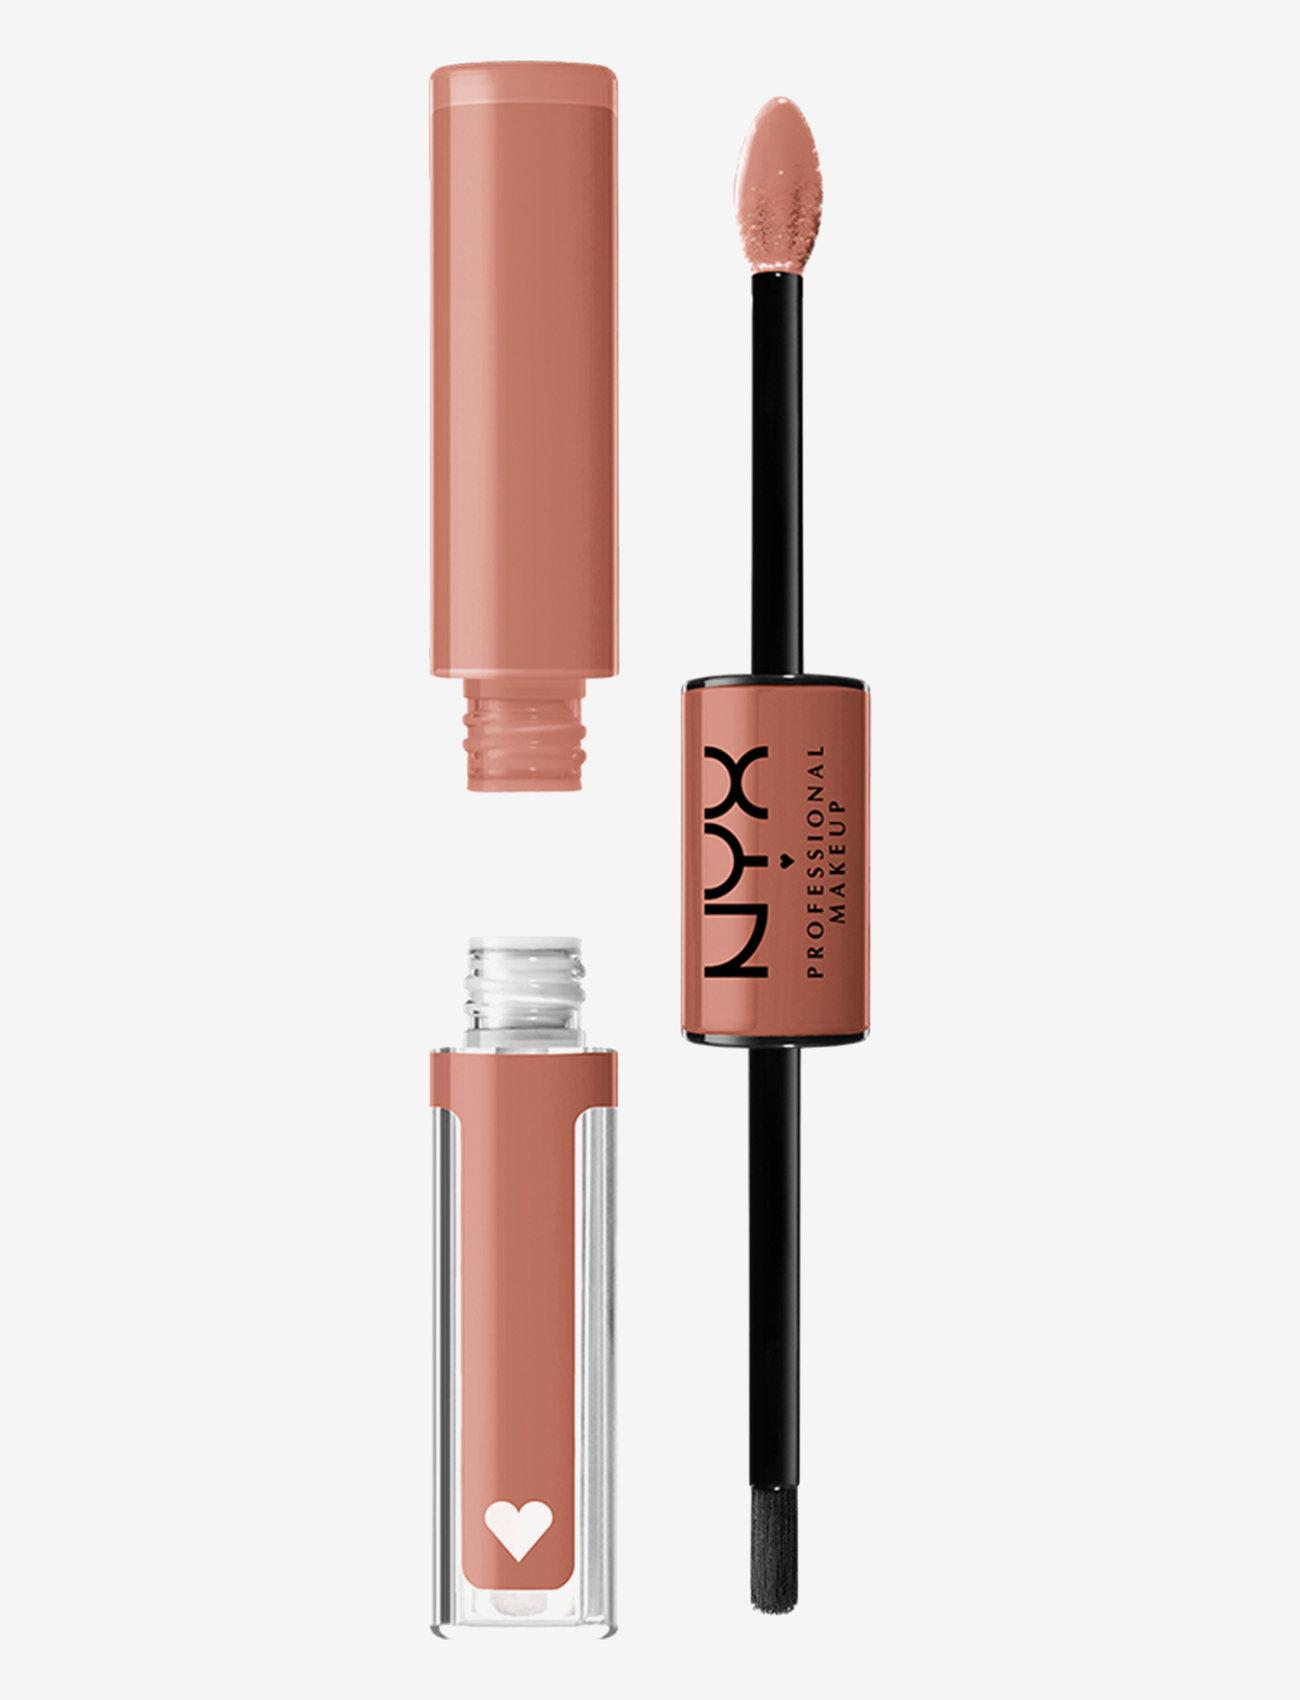 NYX PROFESSIONAL MAKEUP - Shine Loud Pro Pigment Lip Shine - liquid lipstick - global citizen - 0